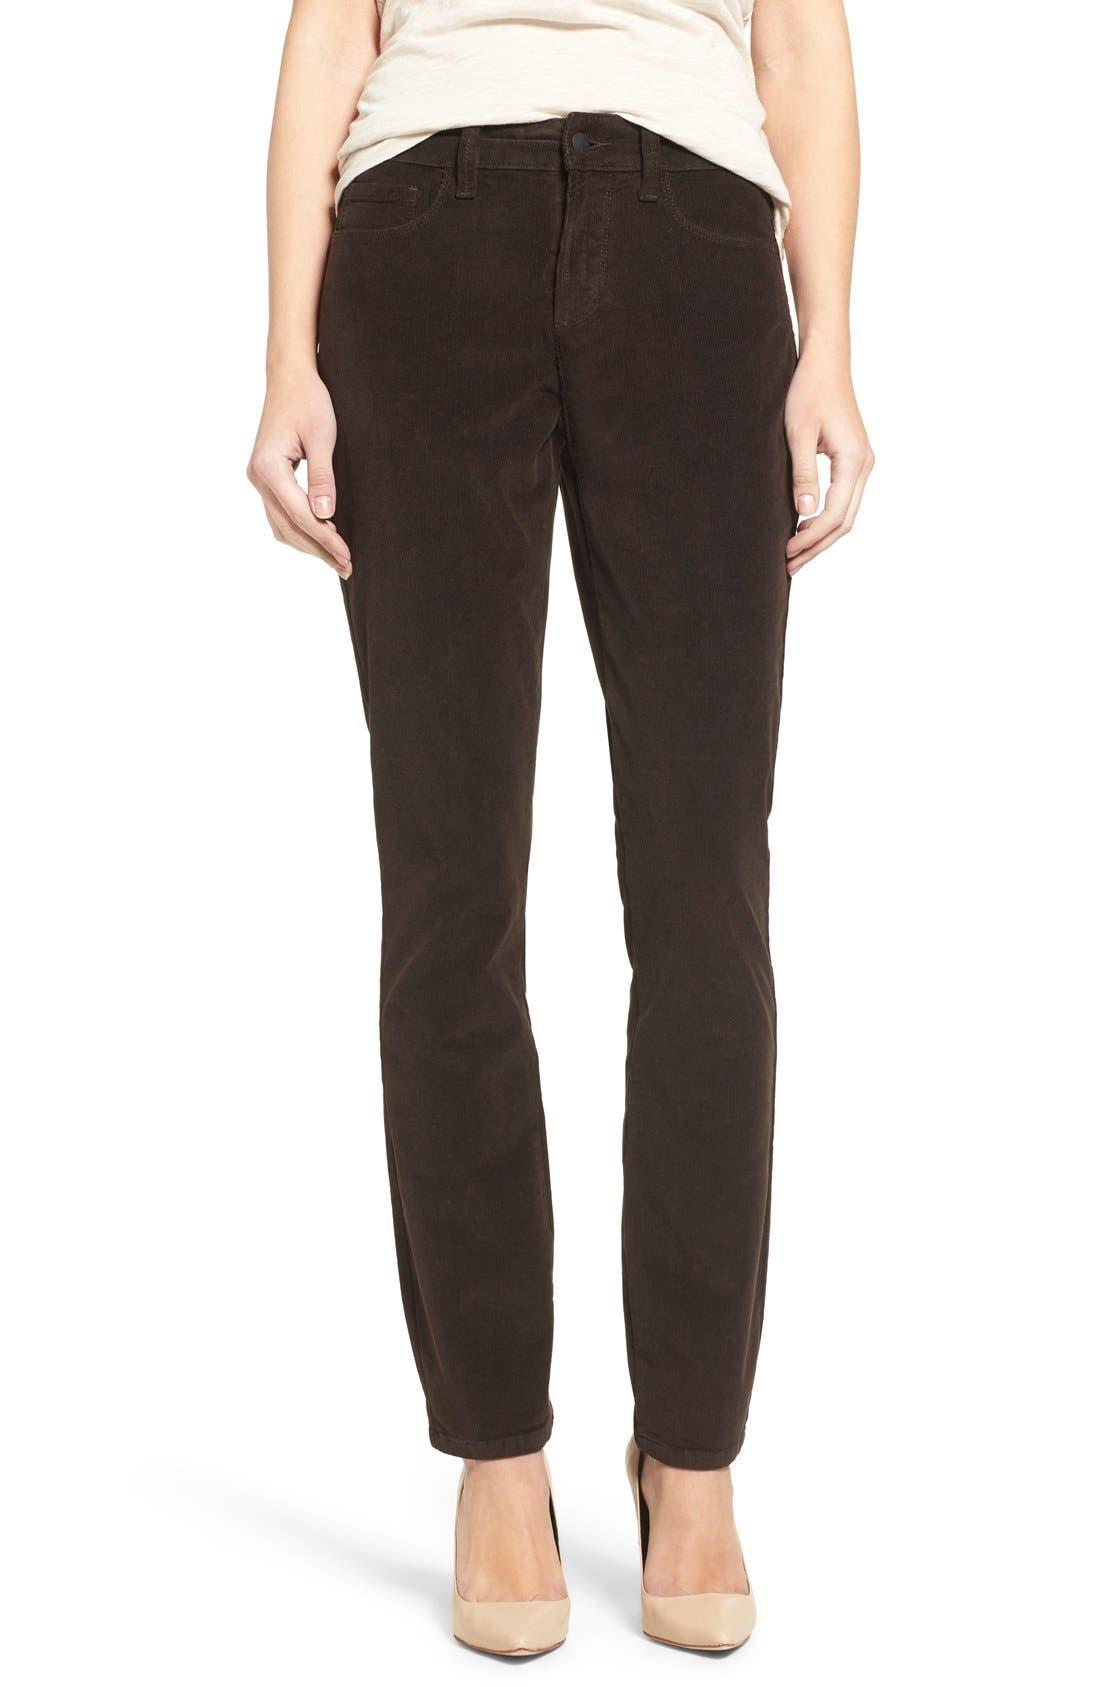 Alternate Image 1 Selected - NYDJ 'Alina' Skinny Stretch Corduroy Pants (Regular & Petite)